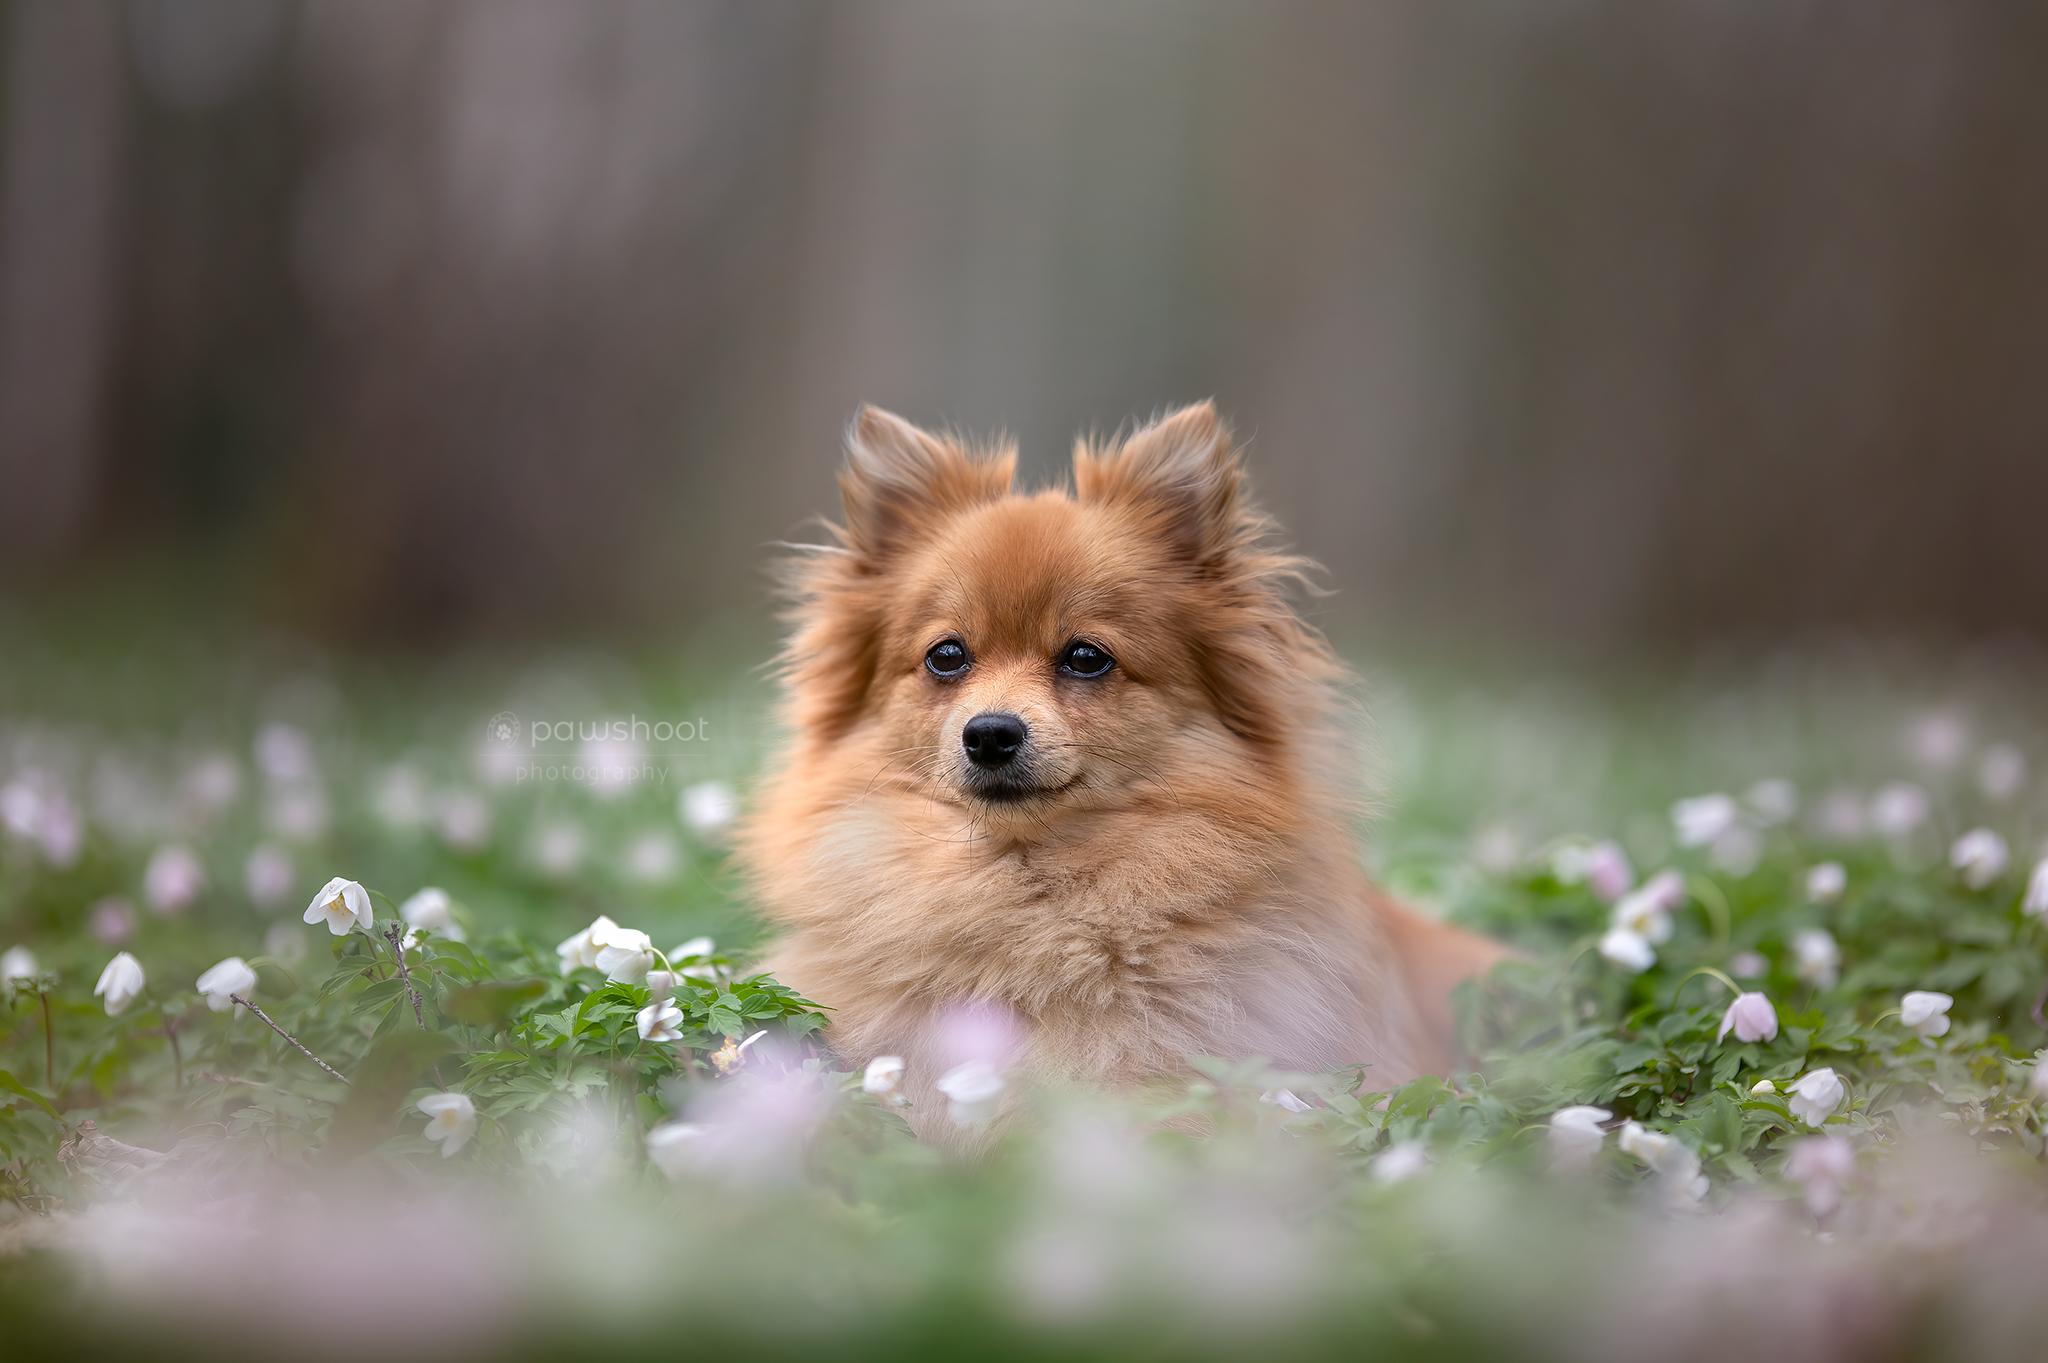 hondje dwergkees in bloemenveld Pawshoot hondenfotografie